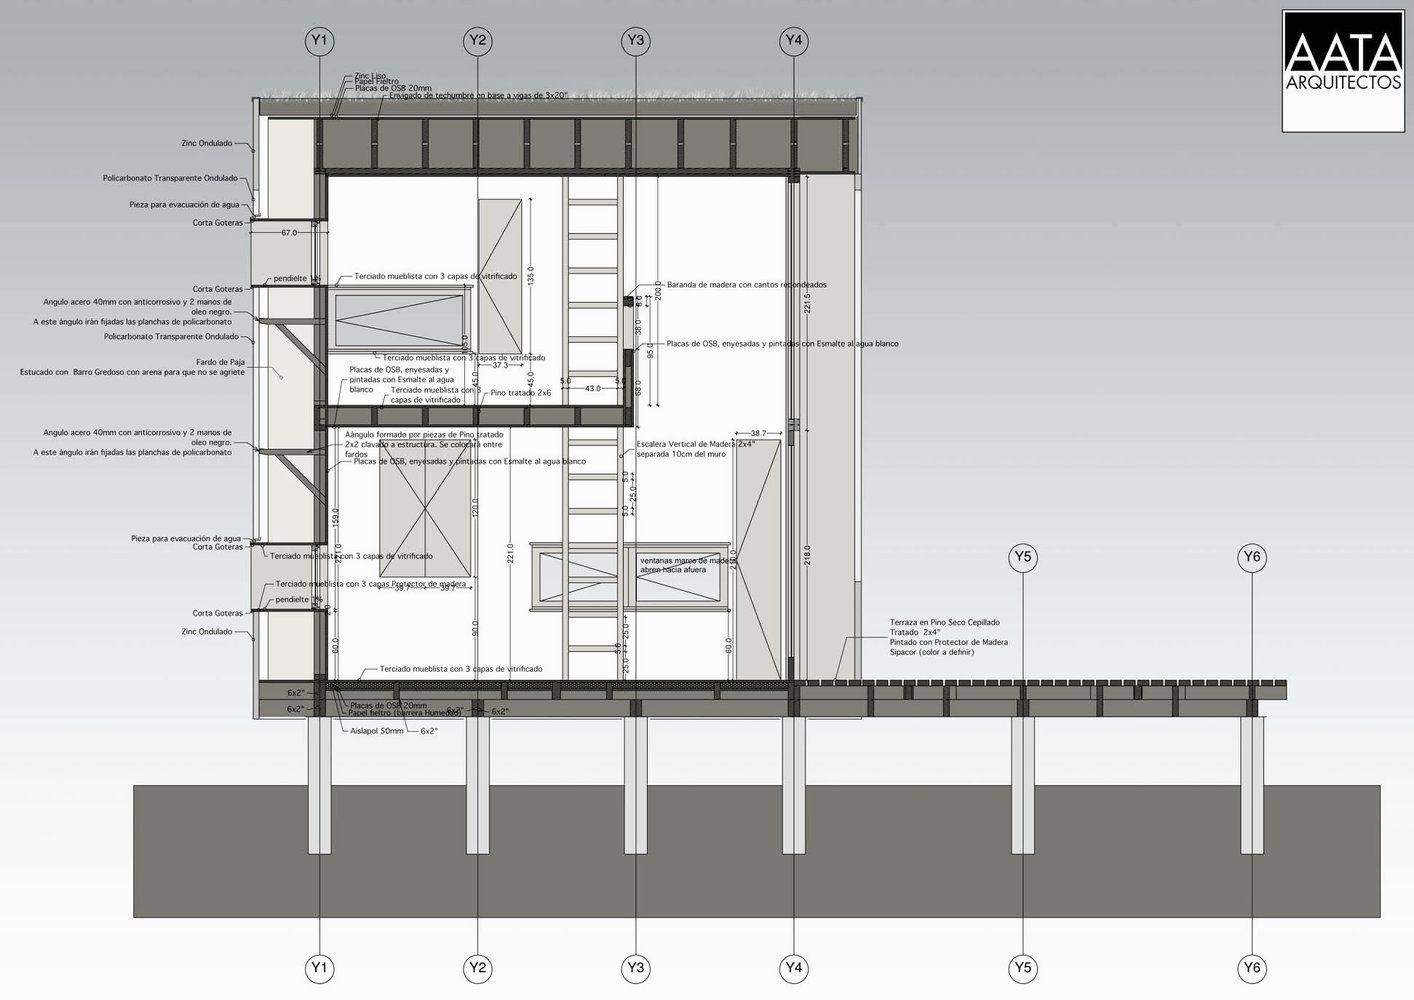 Galer a de en detalle cortes constructivos estructuras - Estructuras metalicas para casas ...